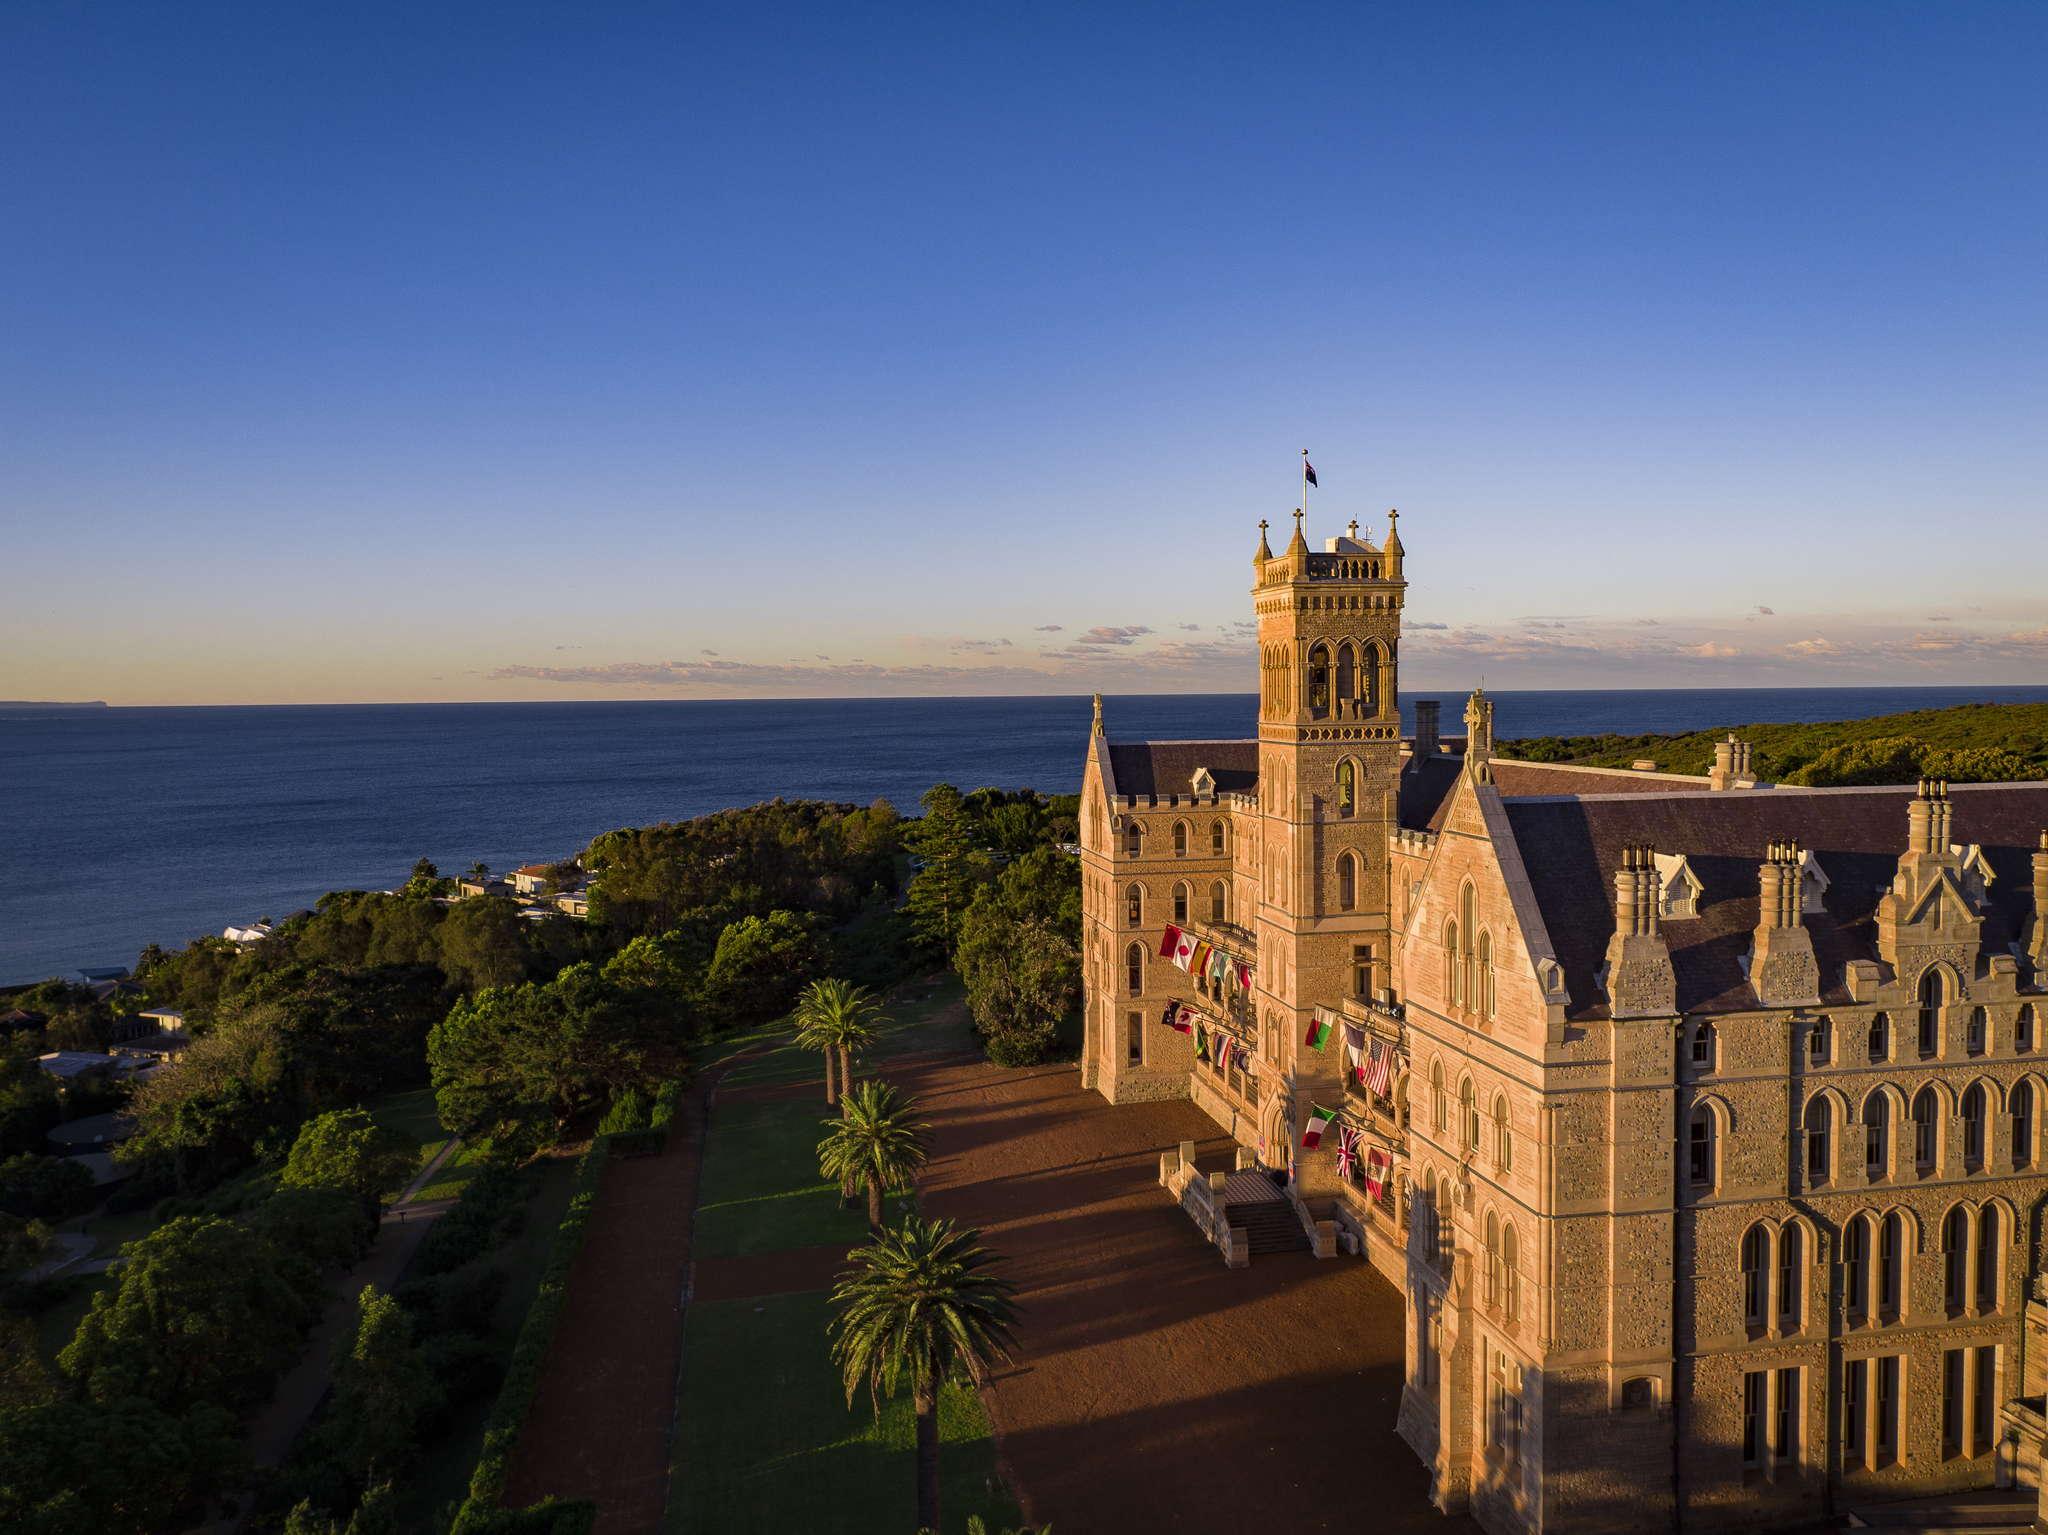 International_College_of_Management_Sydney_2_160701_ICMSMANLY-211